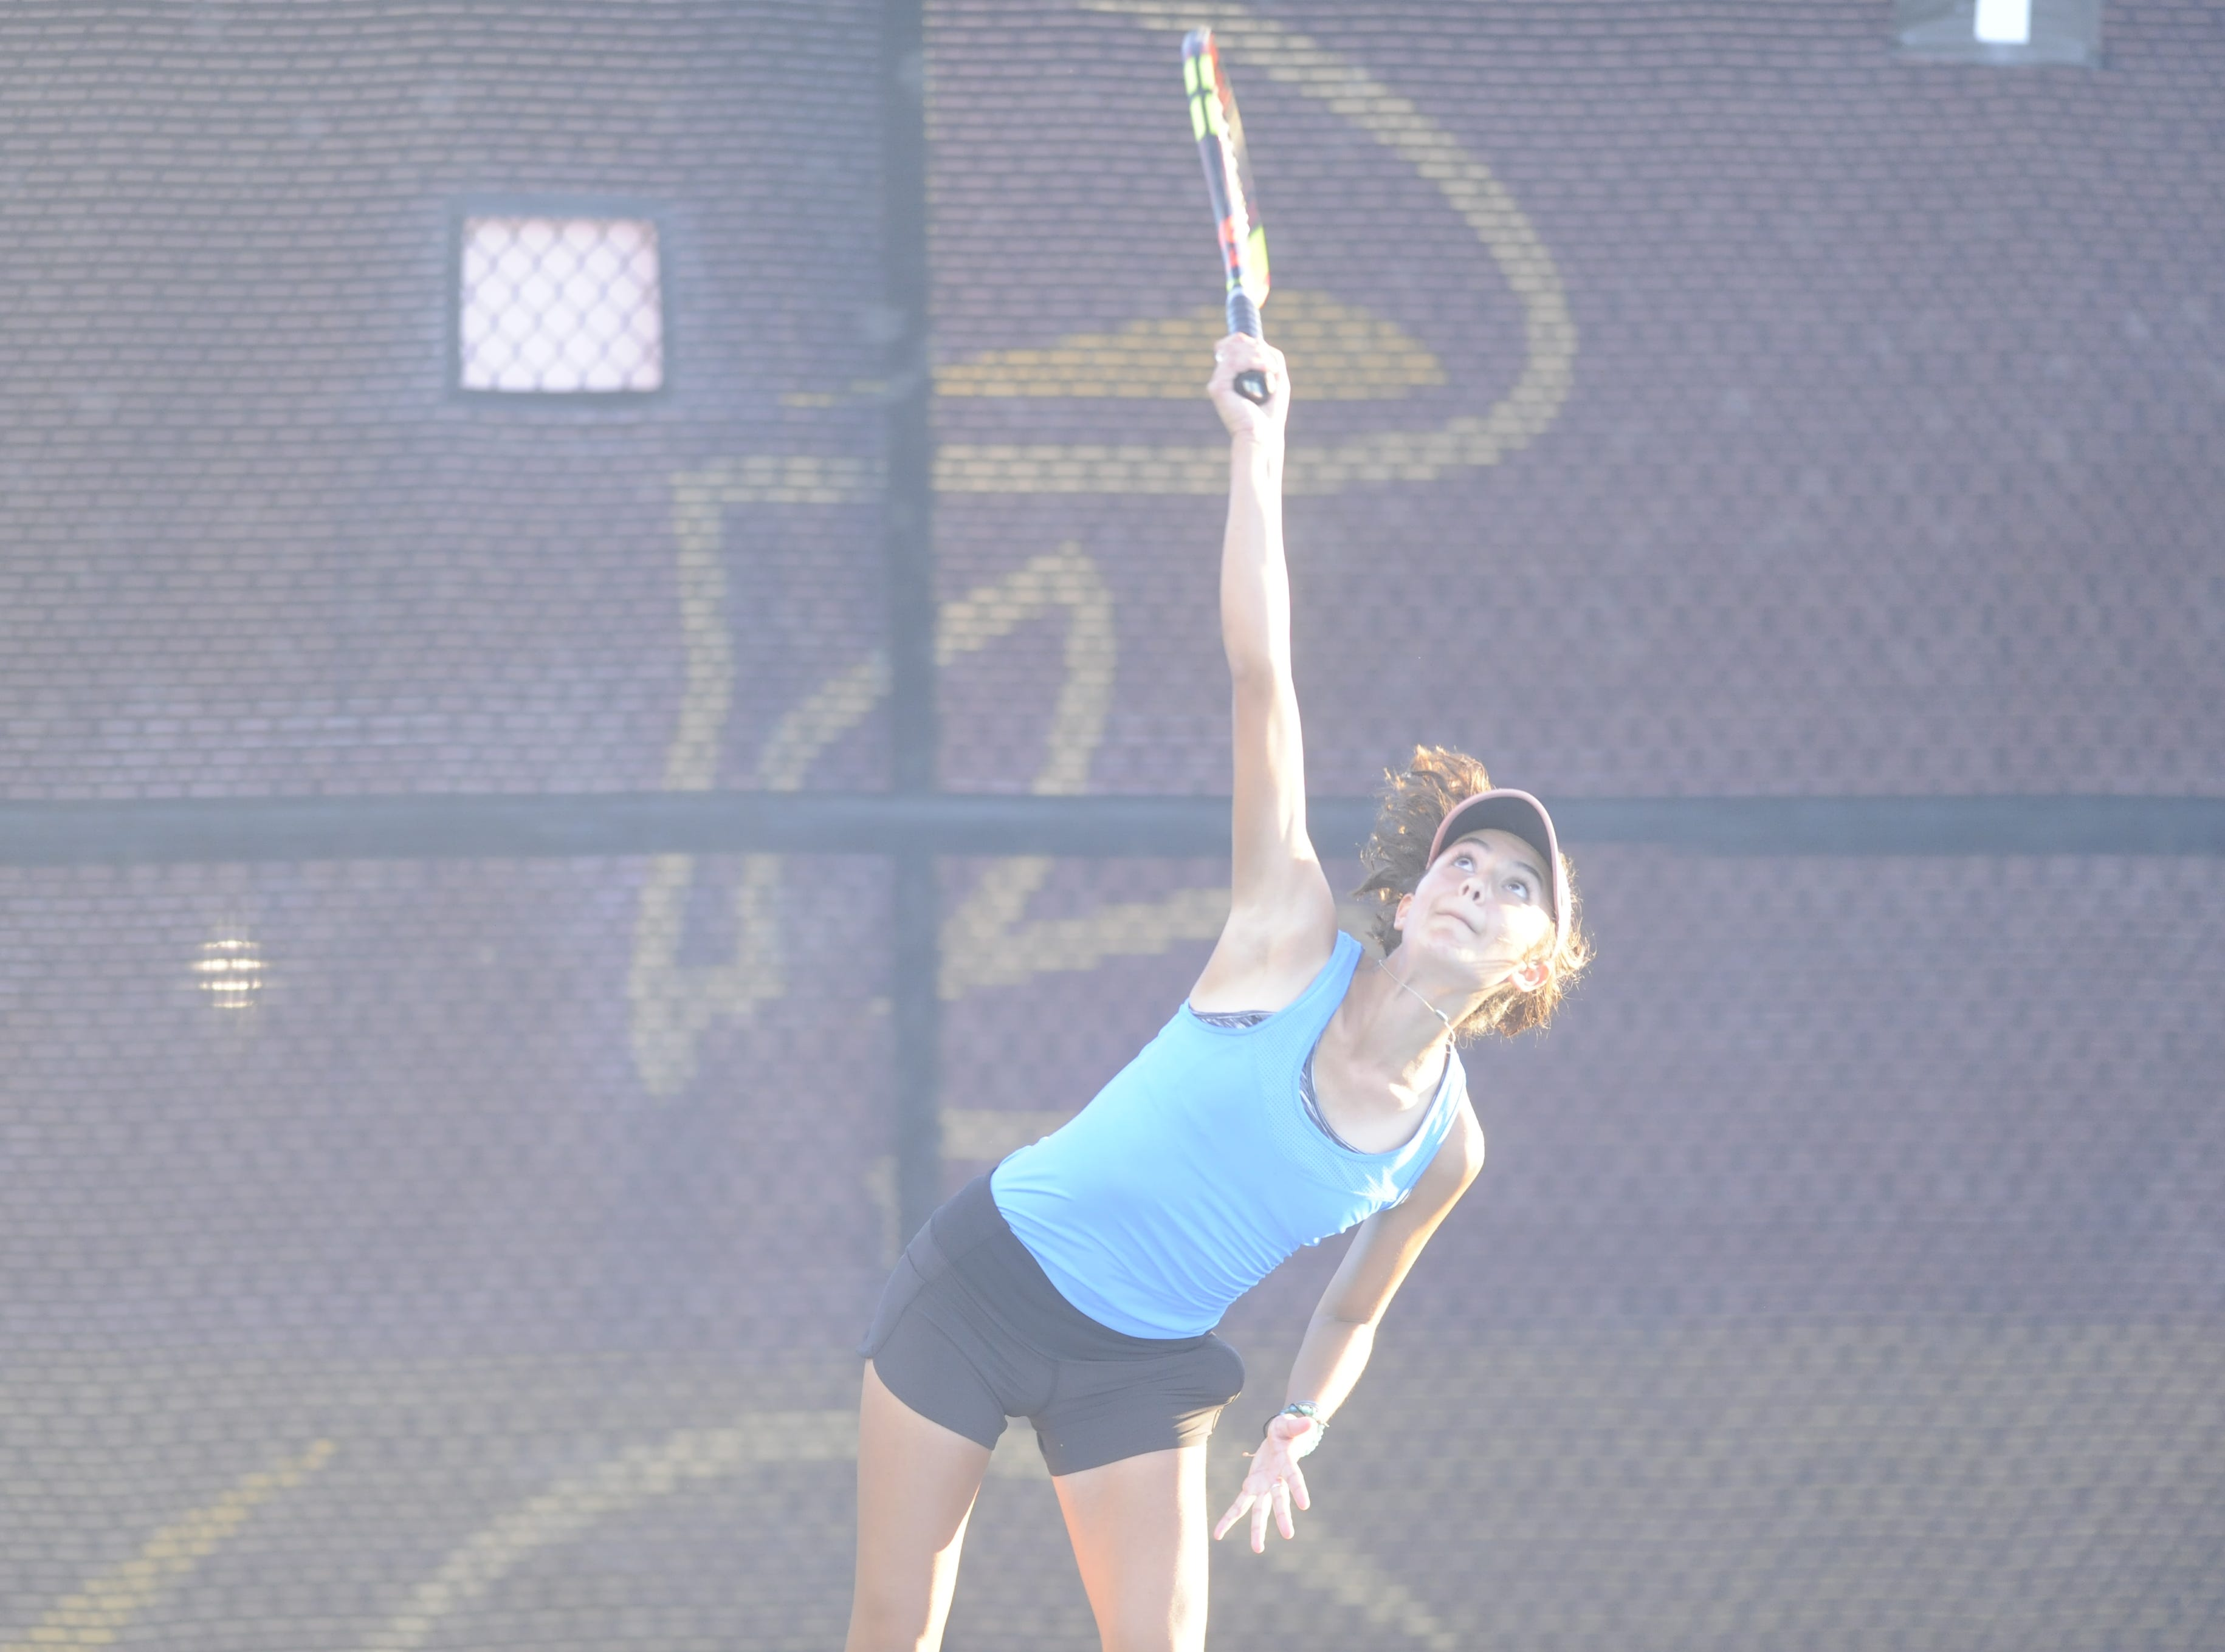 San Angelo Central's Olivia Henderson serves during a match against Abilene High Oct. 9th, 2018.